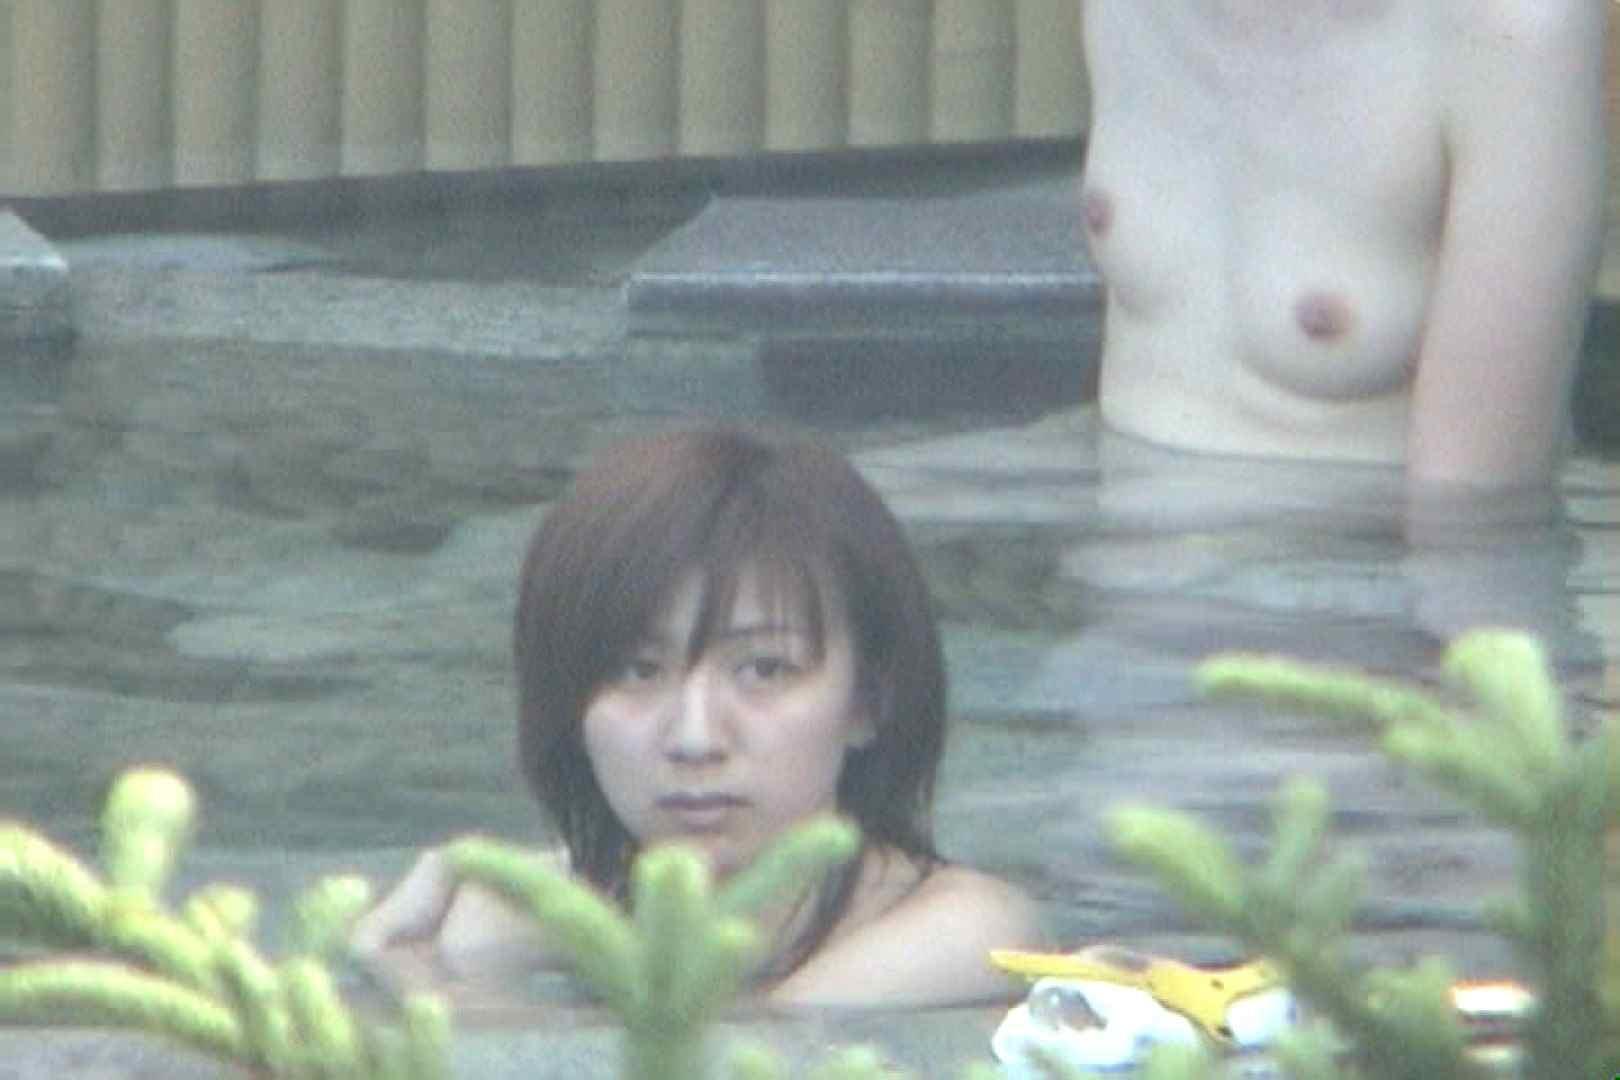 Aquaな露天風呂Vol.77【VIP限定】 盗撮   OLセックス  107画像 79